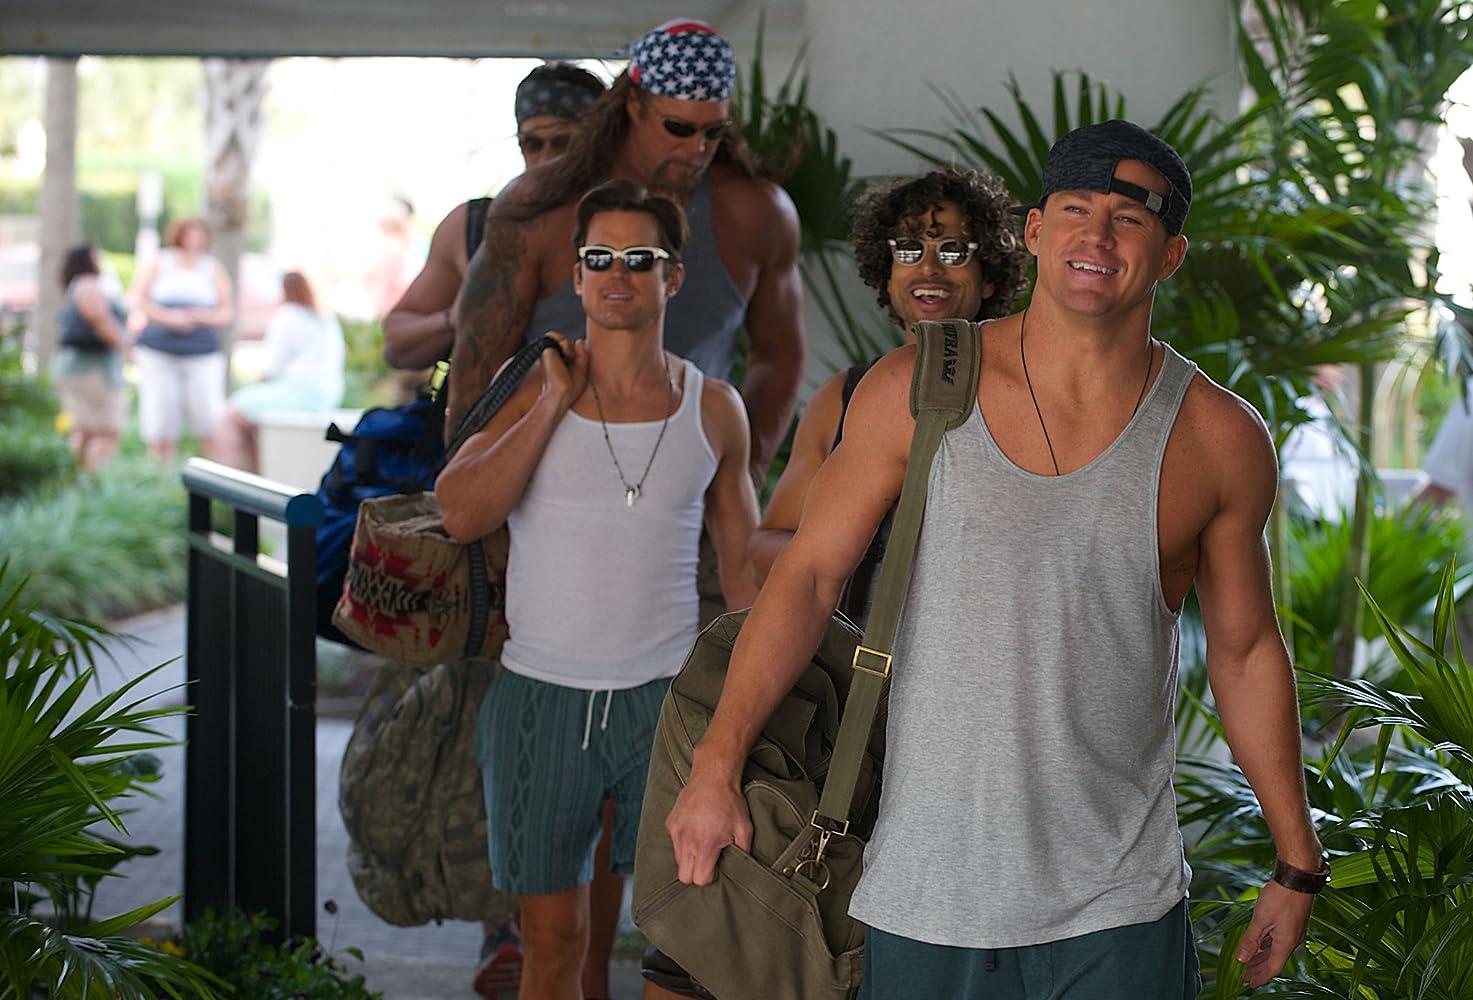 Matt Bomer, Kevin Nash, Adam Rodriguez, and Channing Tatum in Magic Mike XXL (2015)